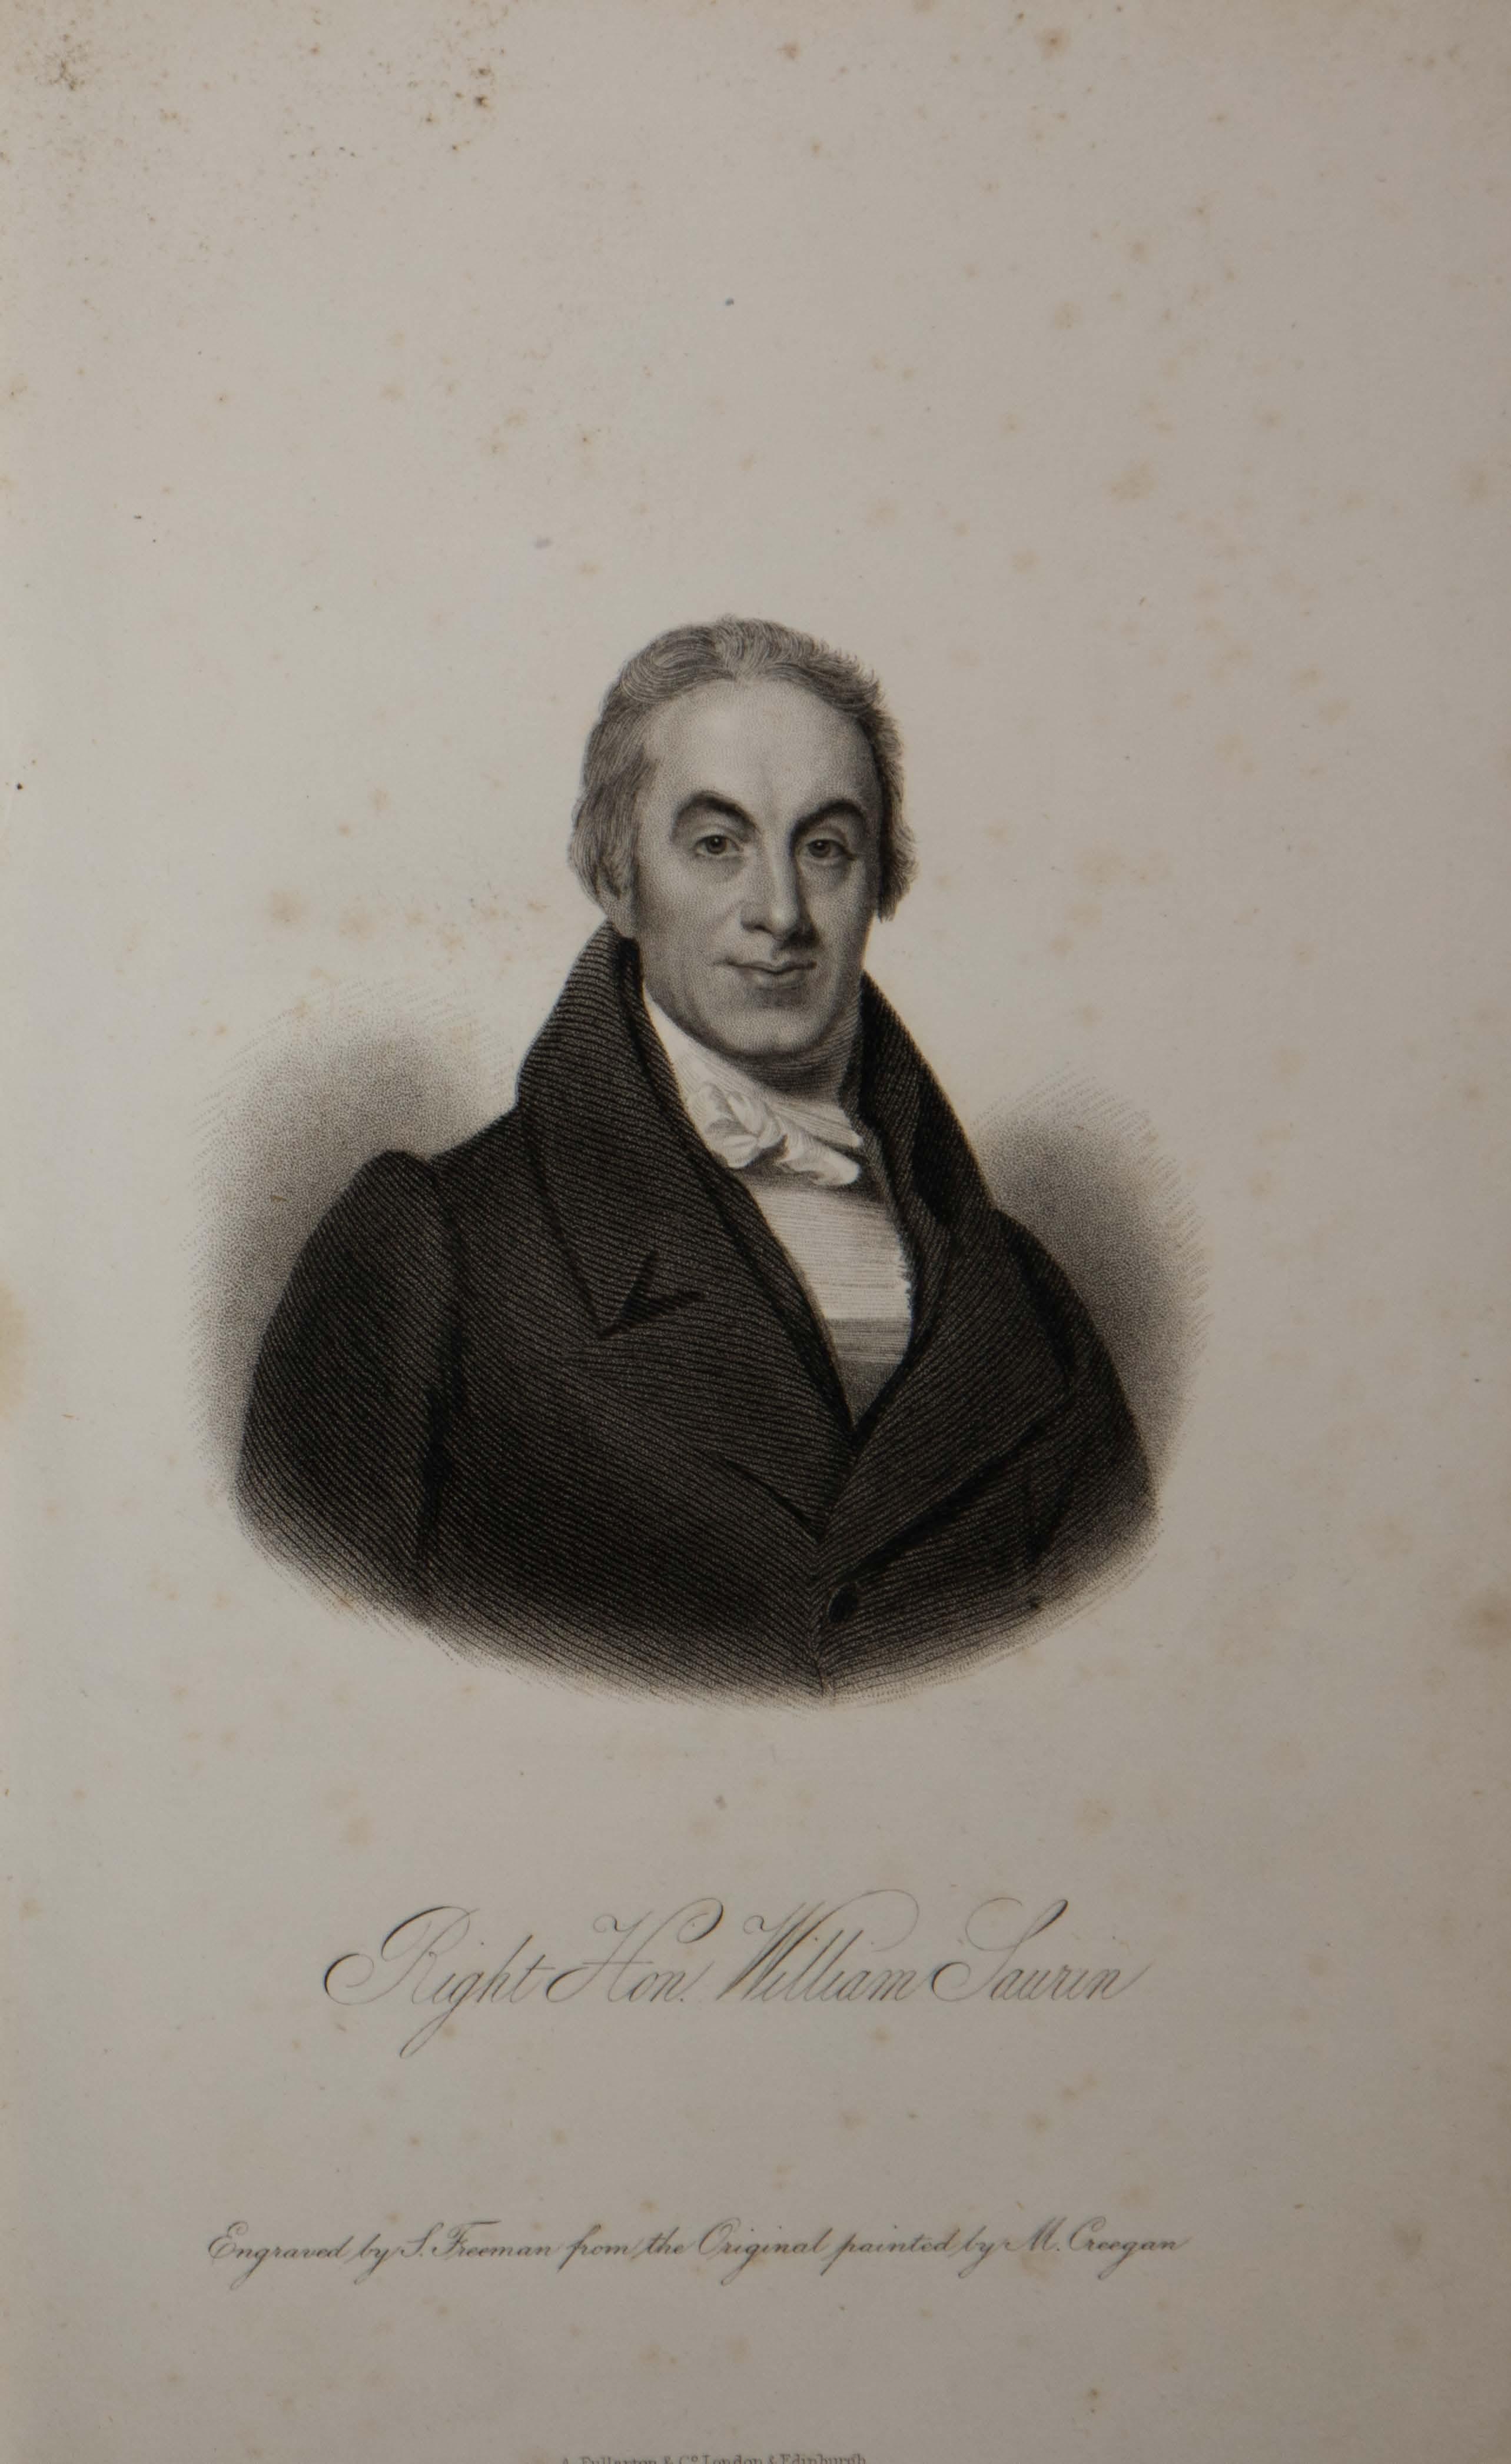 photo of The Lives of Illustrious Irishmen Vol VI Part II, 1847